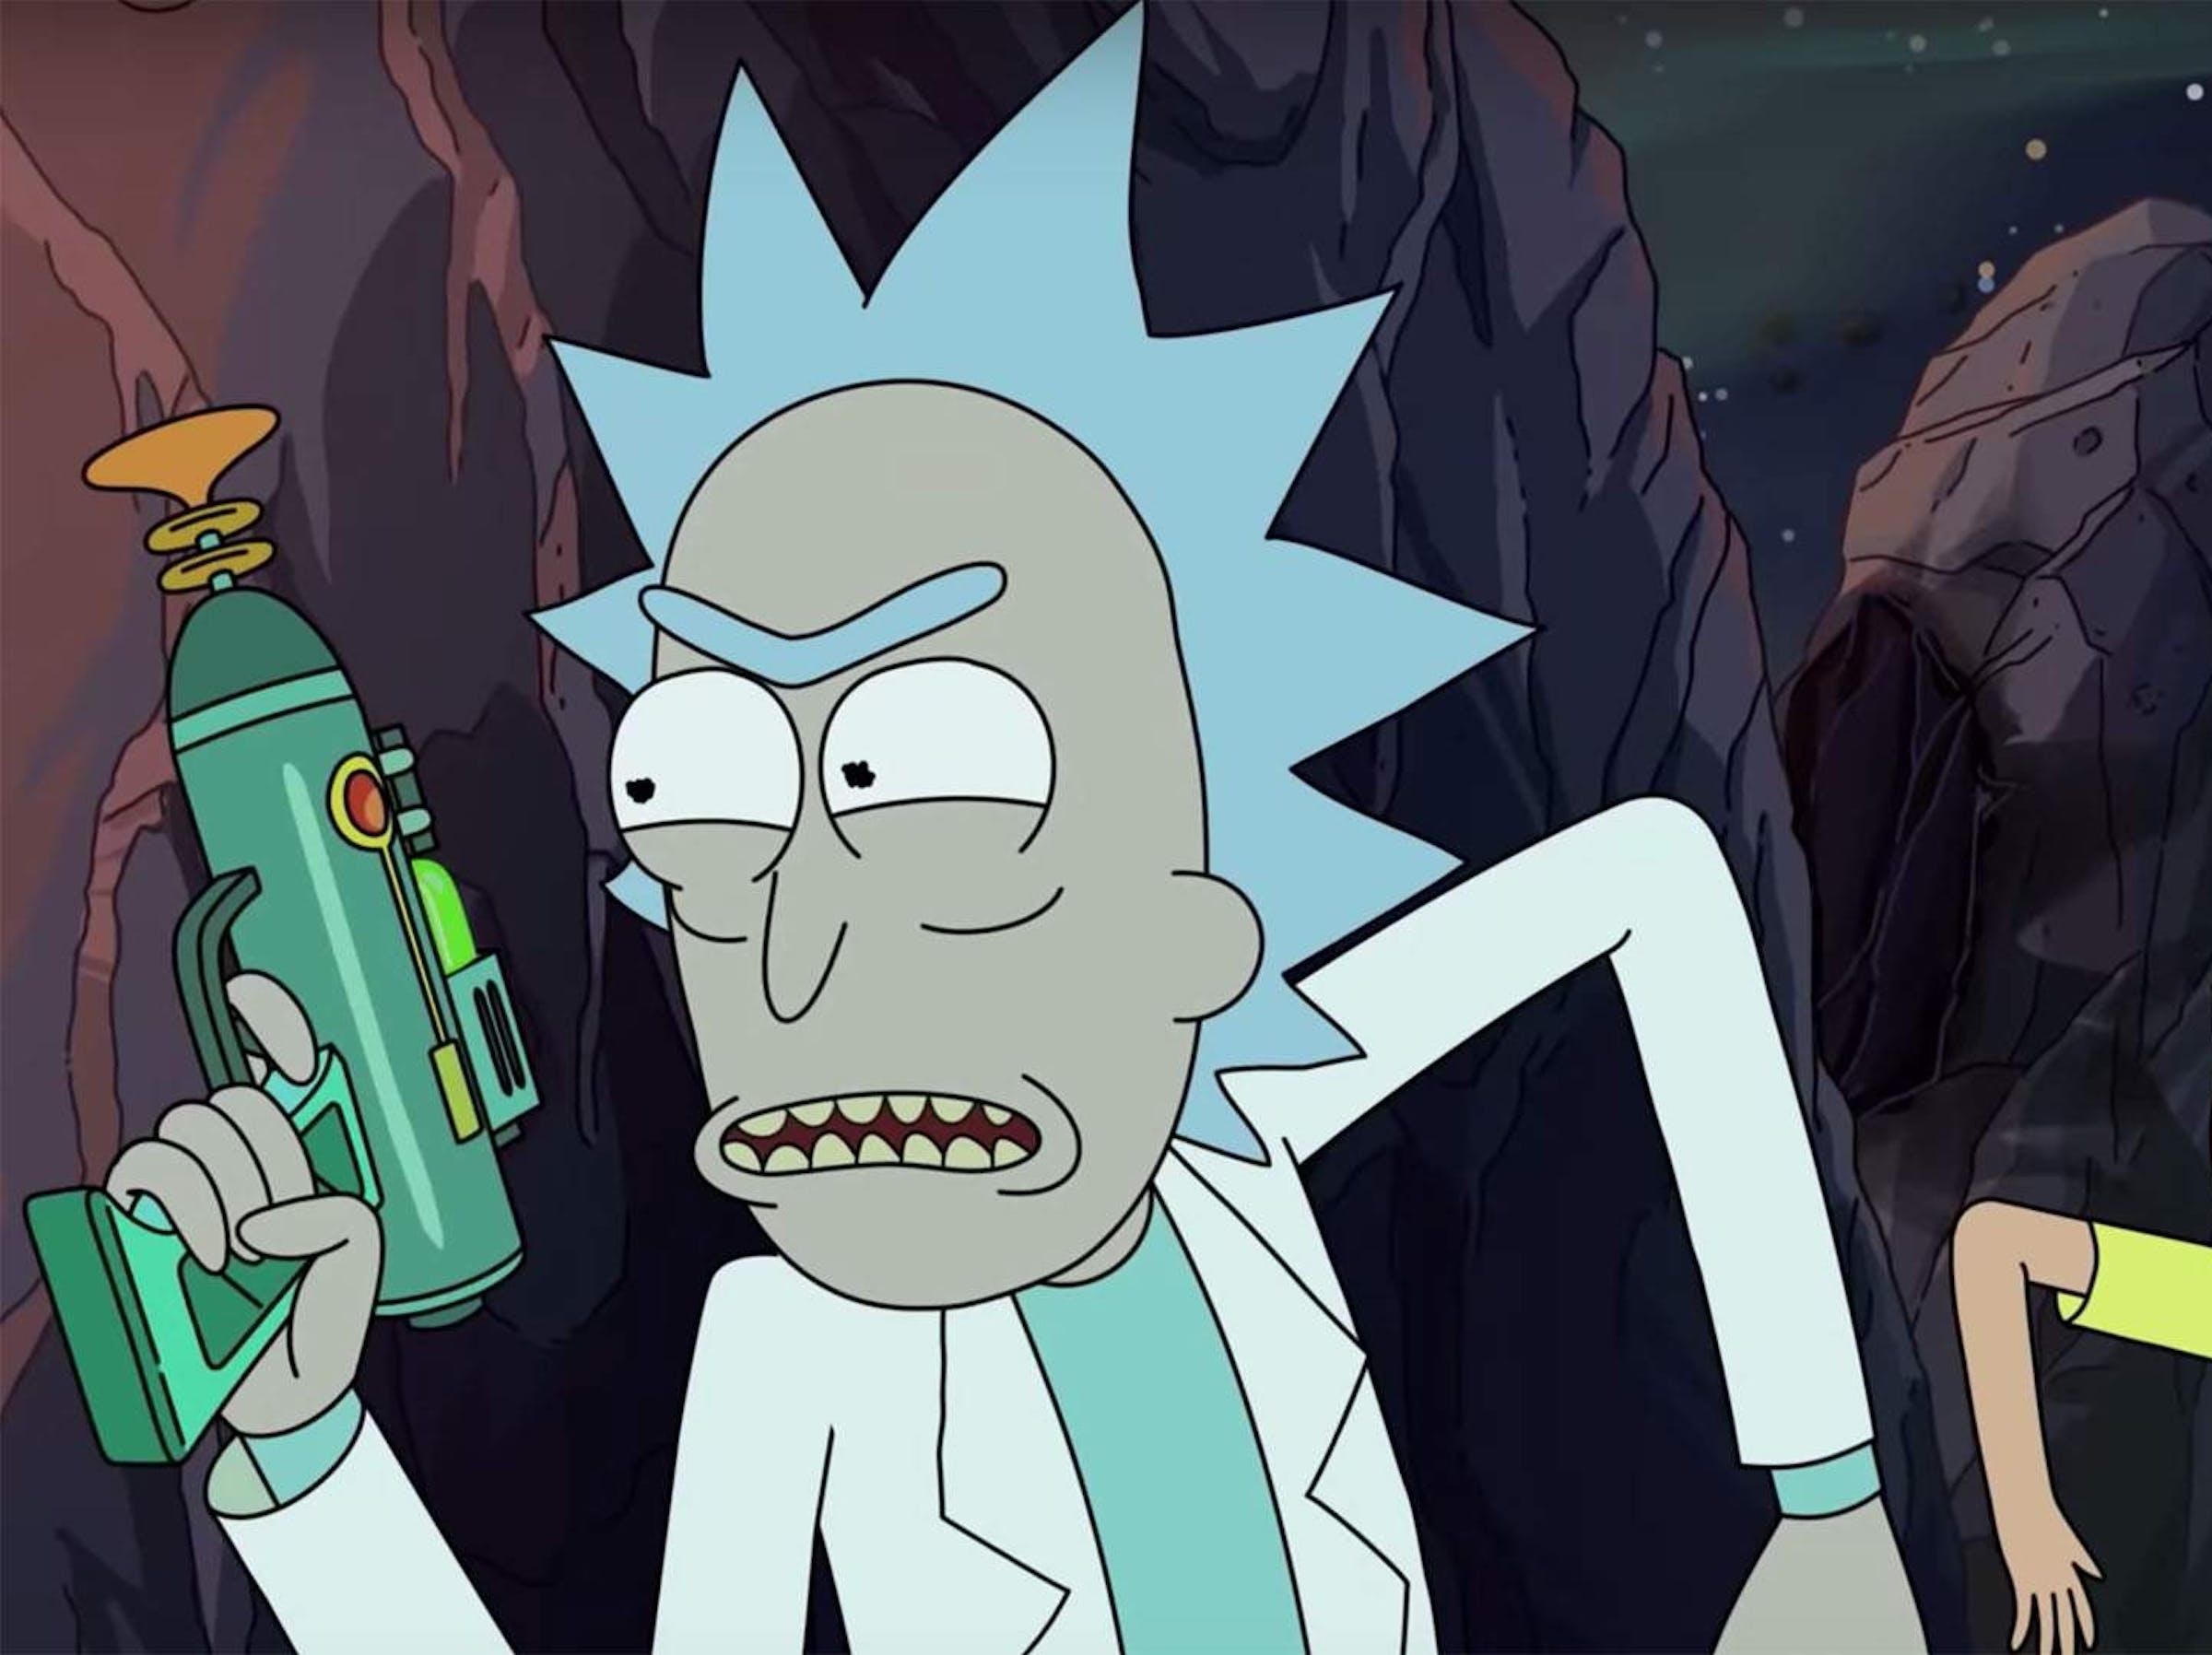 rick and morty season 1 episode 4